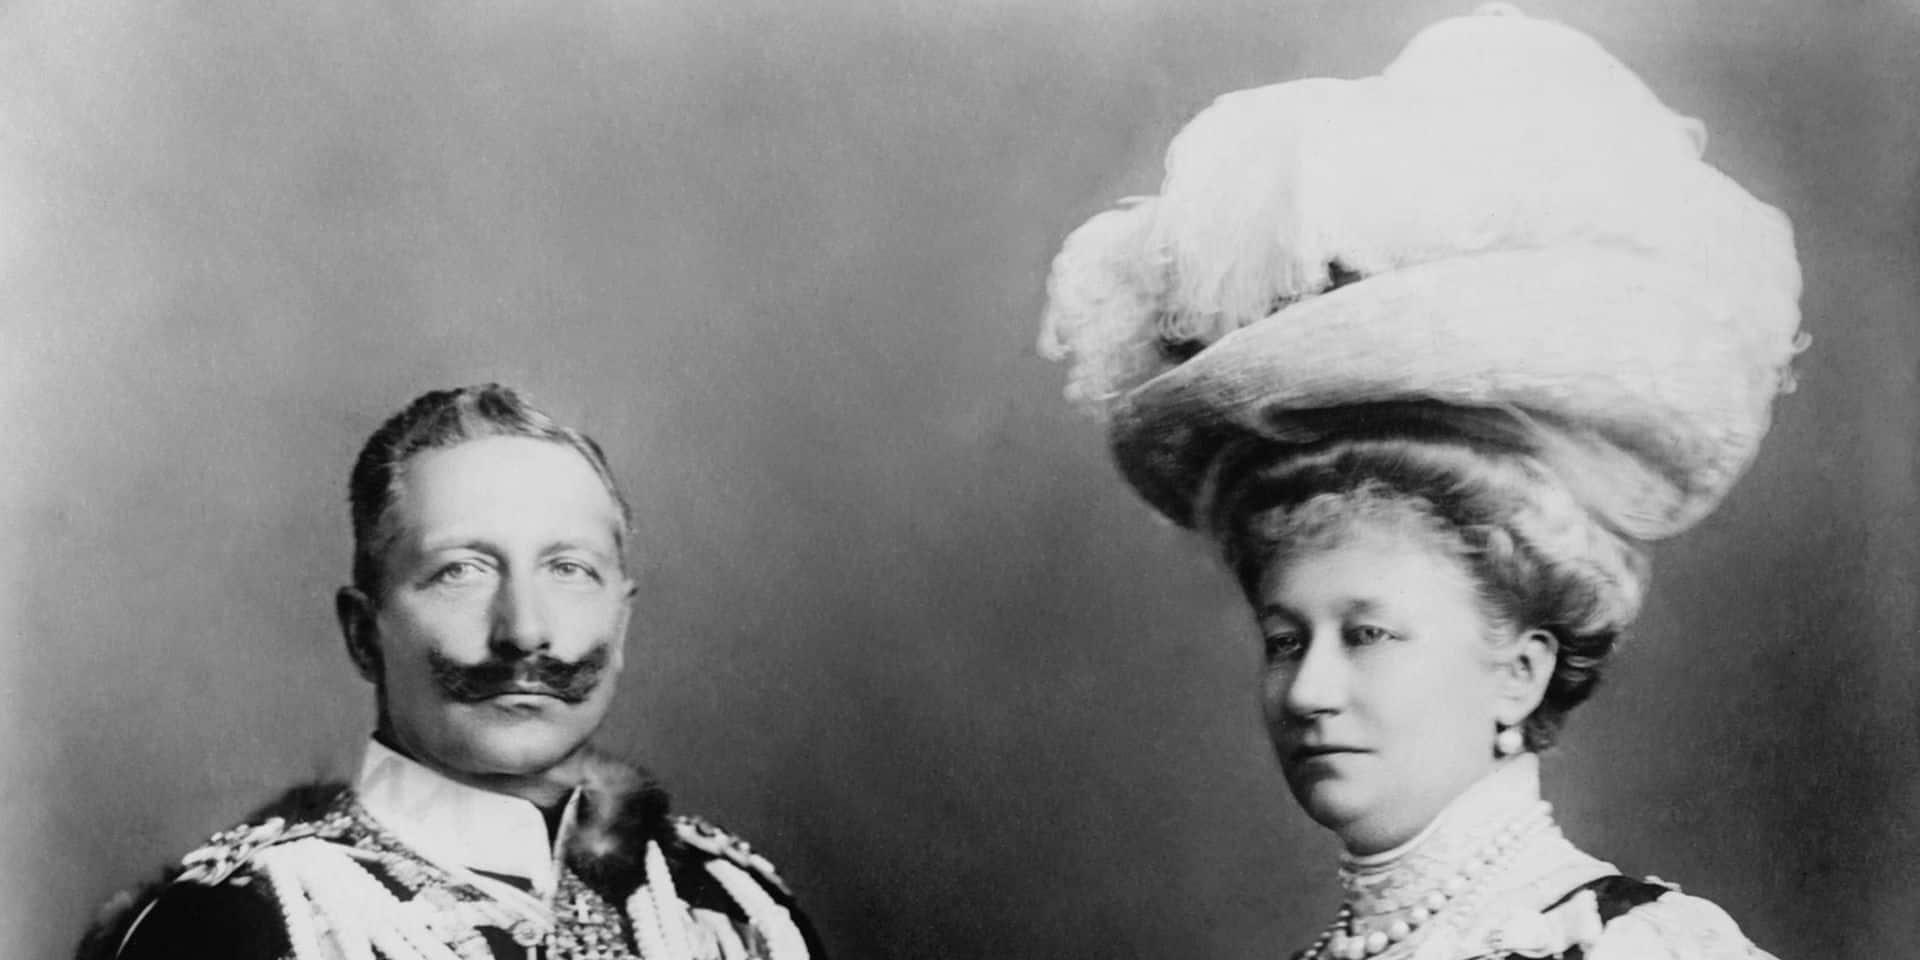 La reine Auguste-Viktoria de Prusse, la dernière impératrice allemande